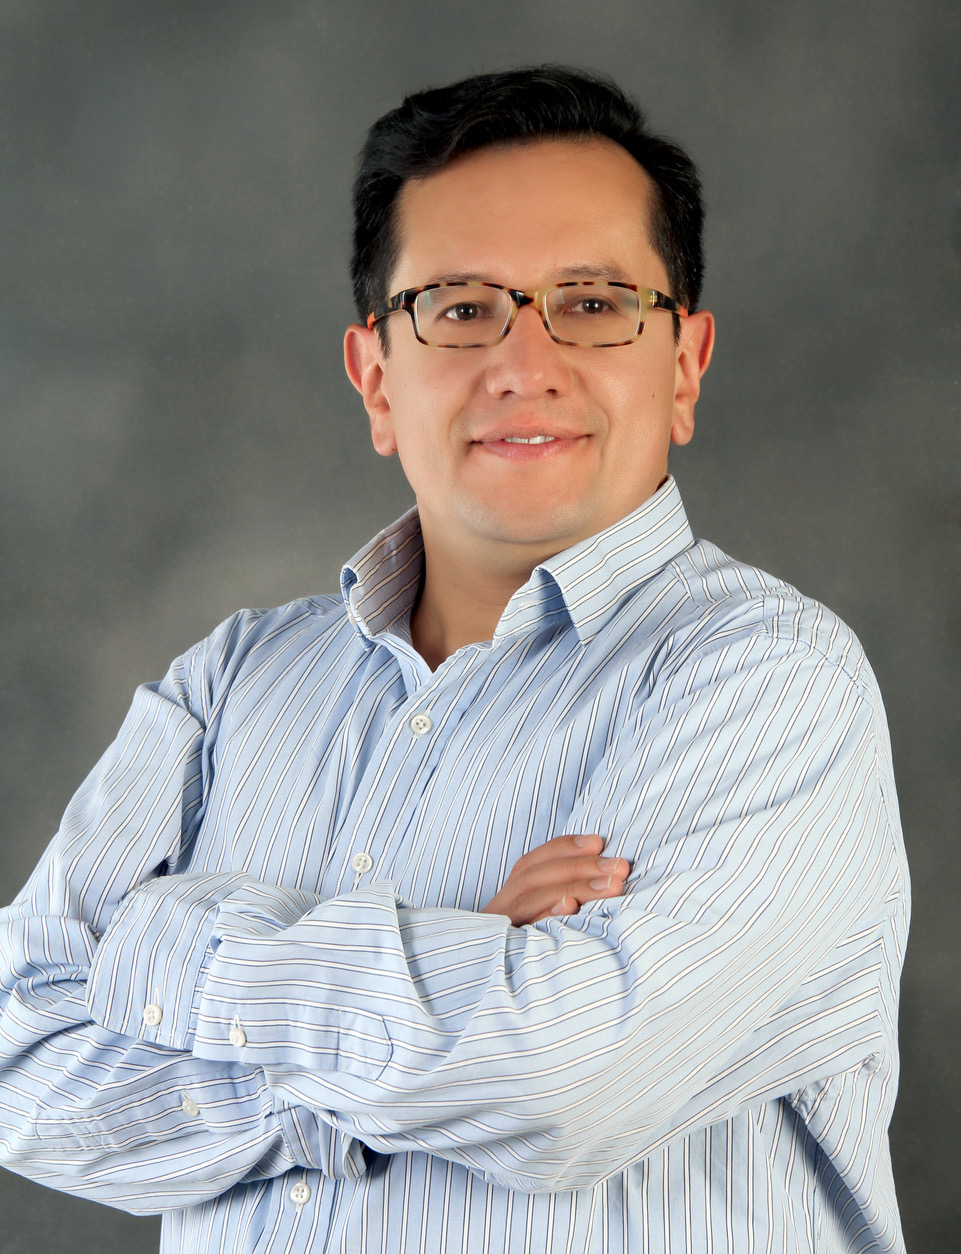 Felipe Carlos Cepeda_Pic